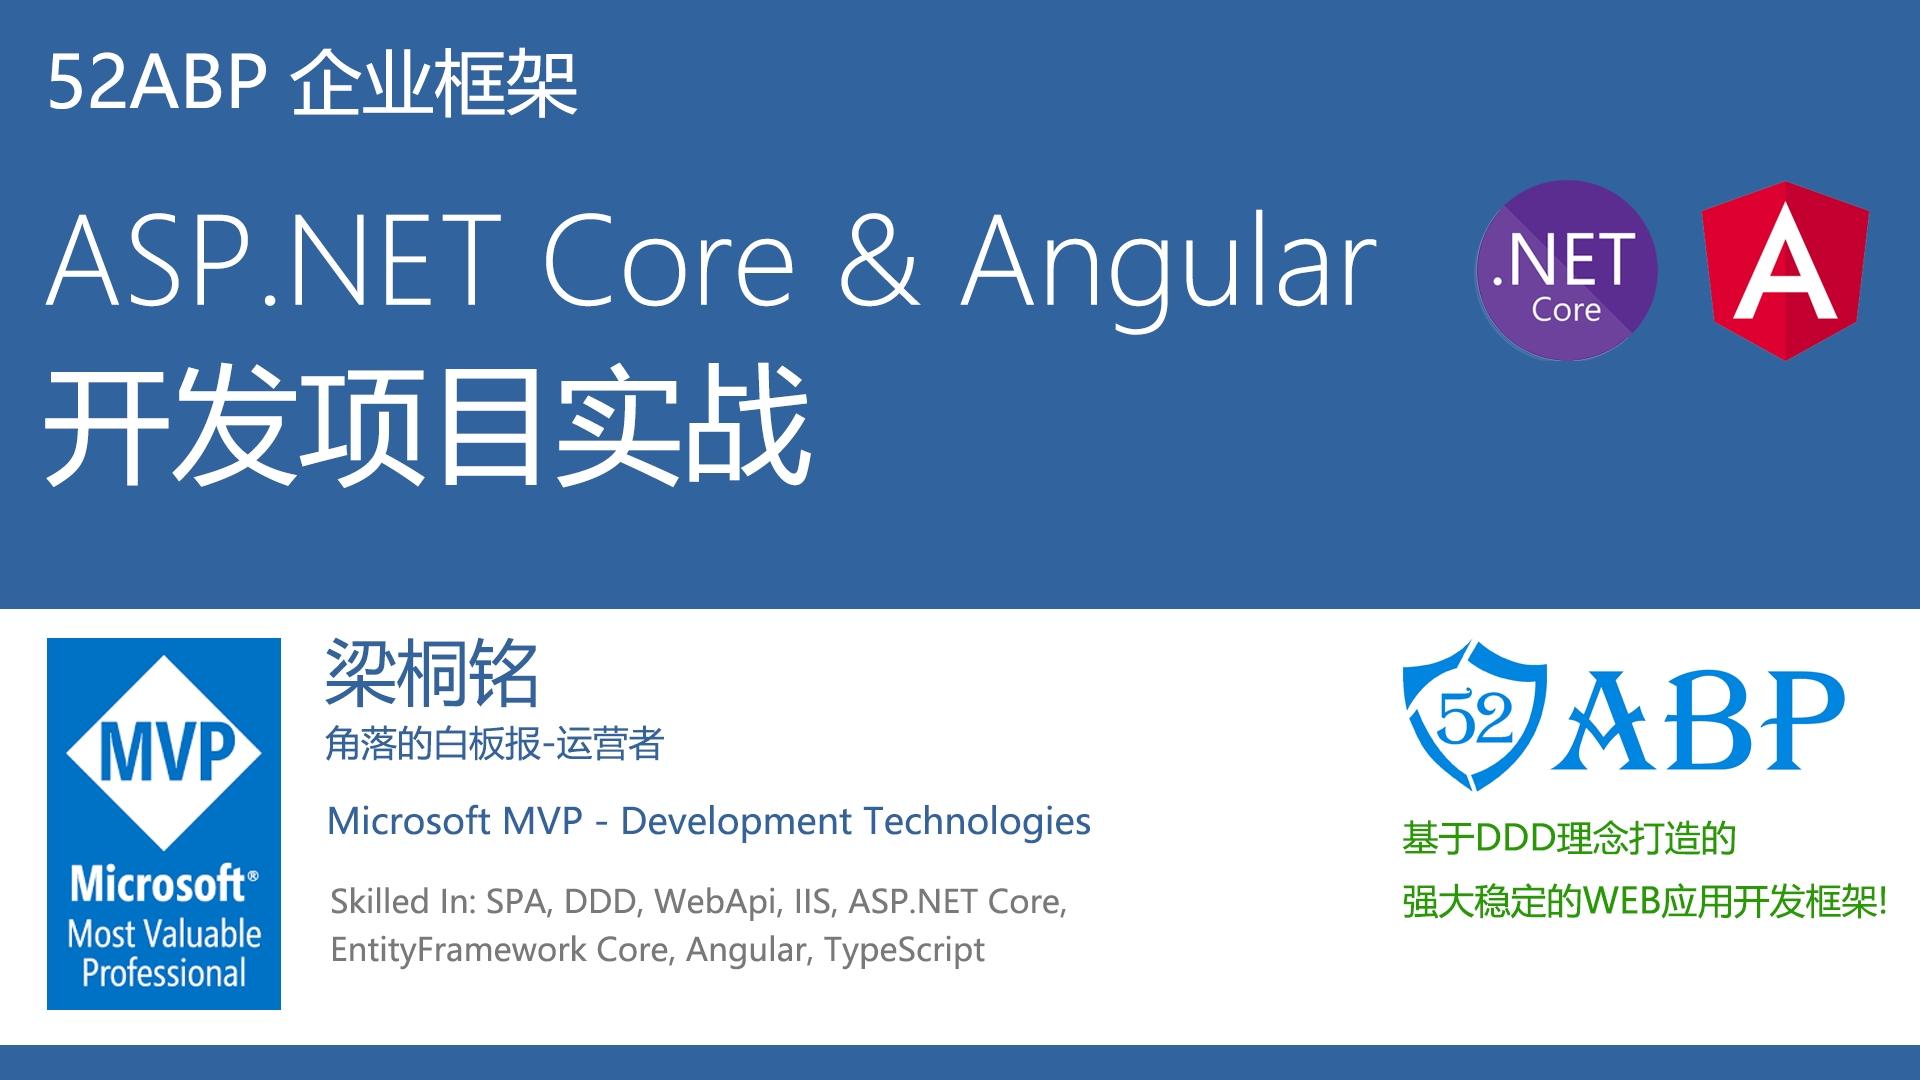 52ABP框架ASP.NET Core与Angular开发教程的封面图片